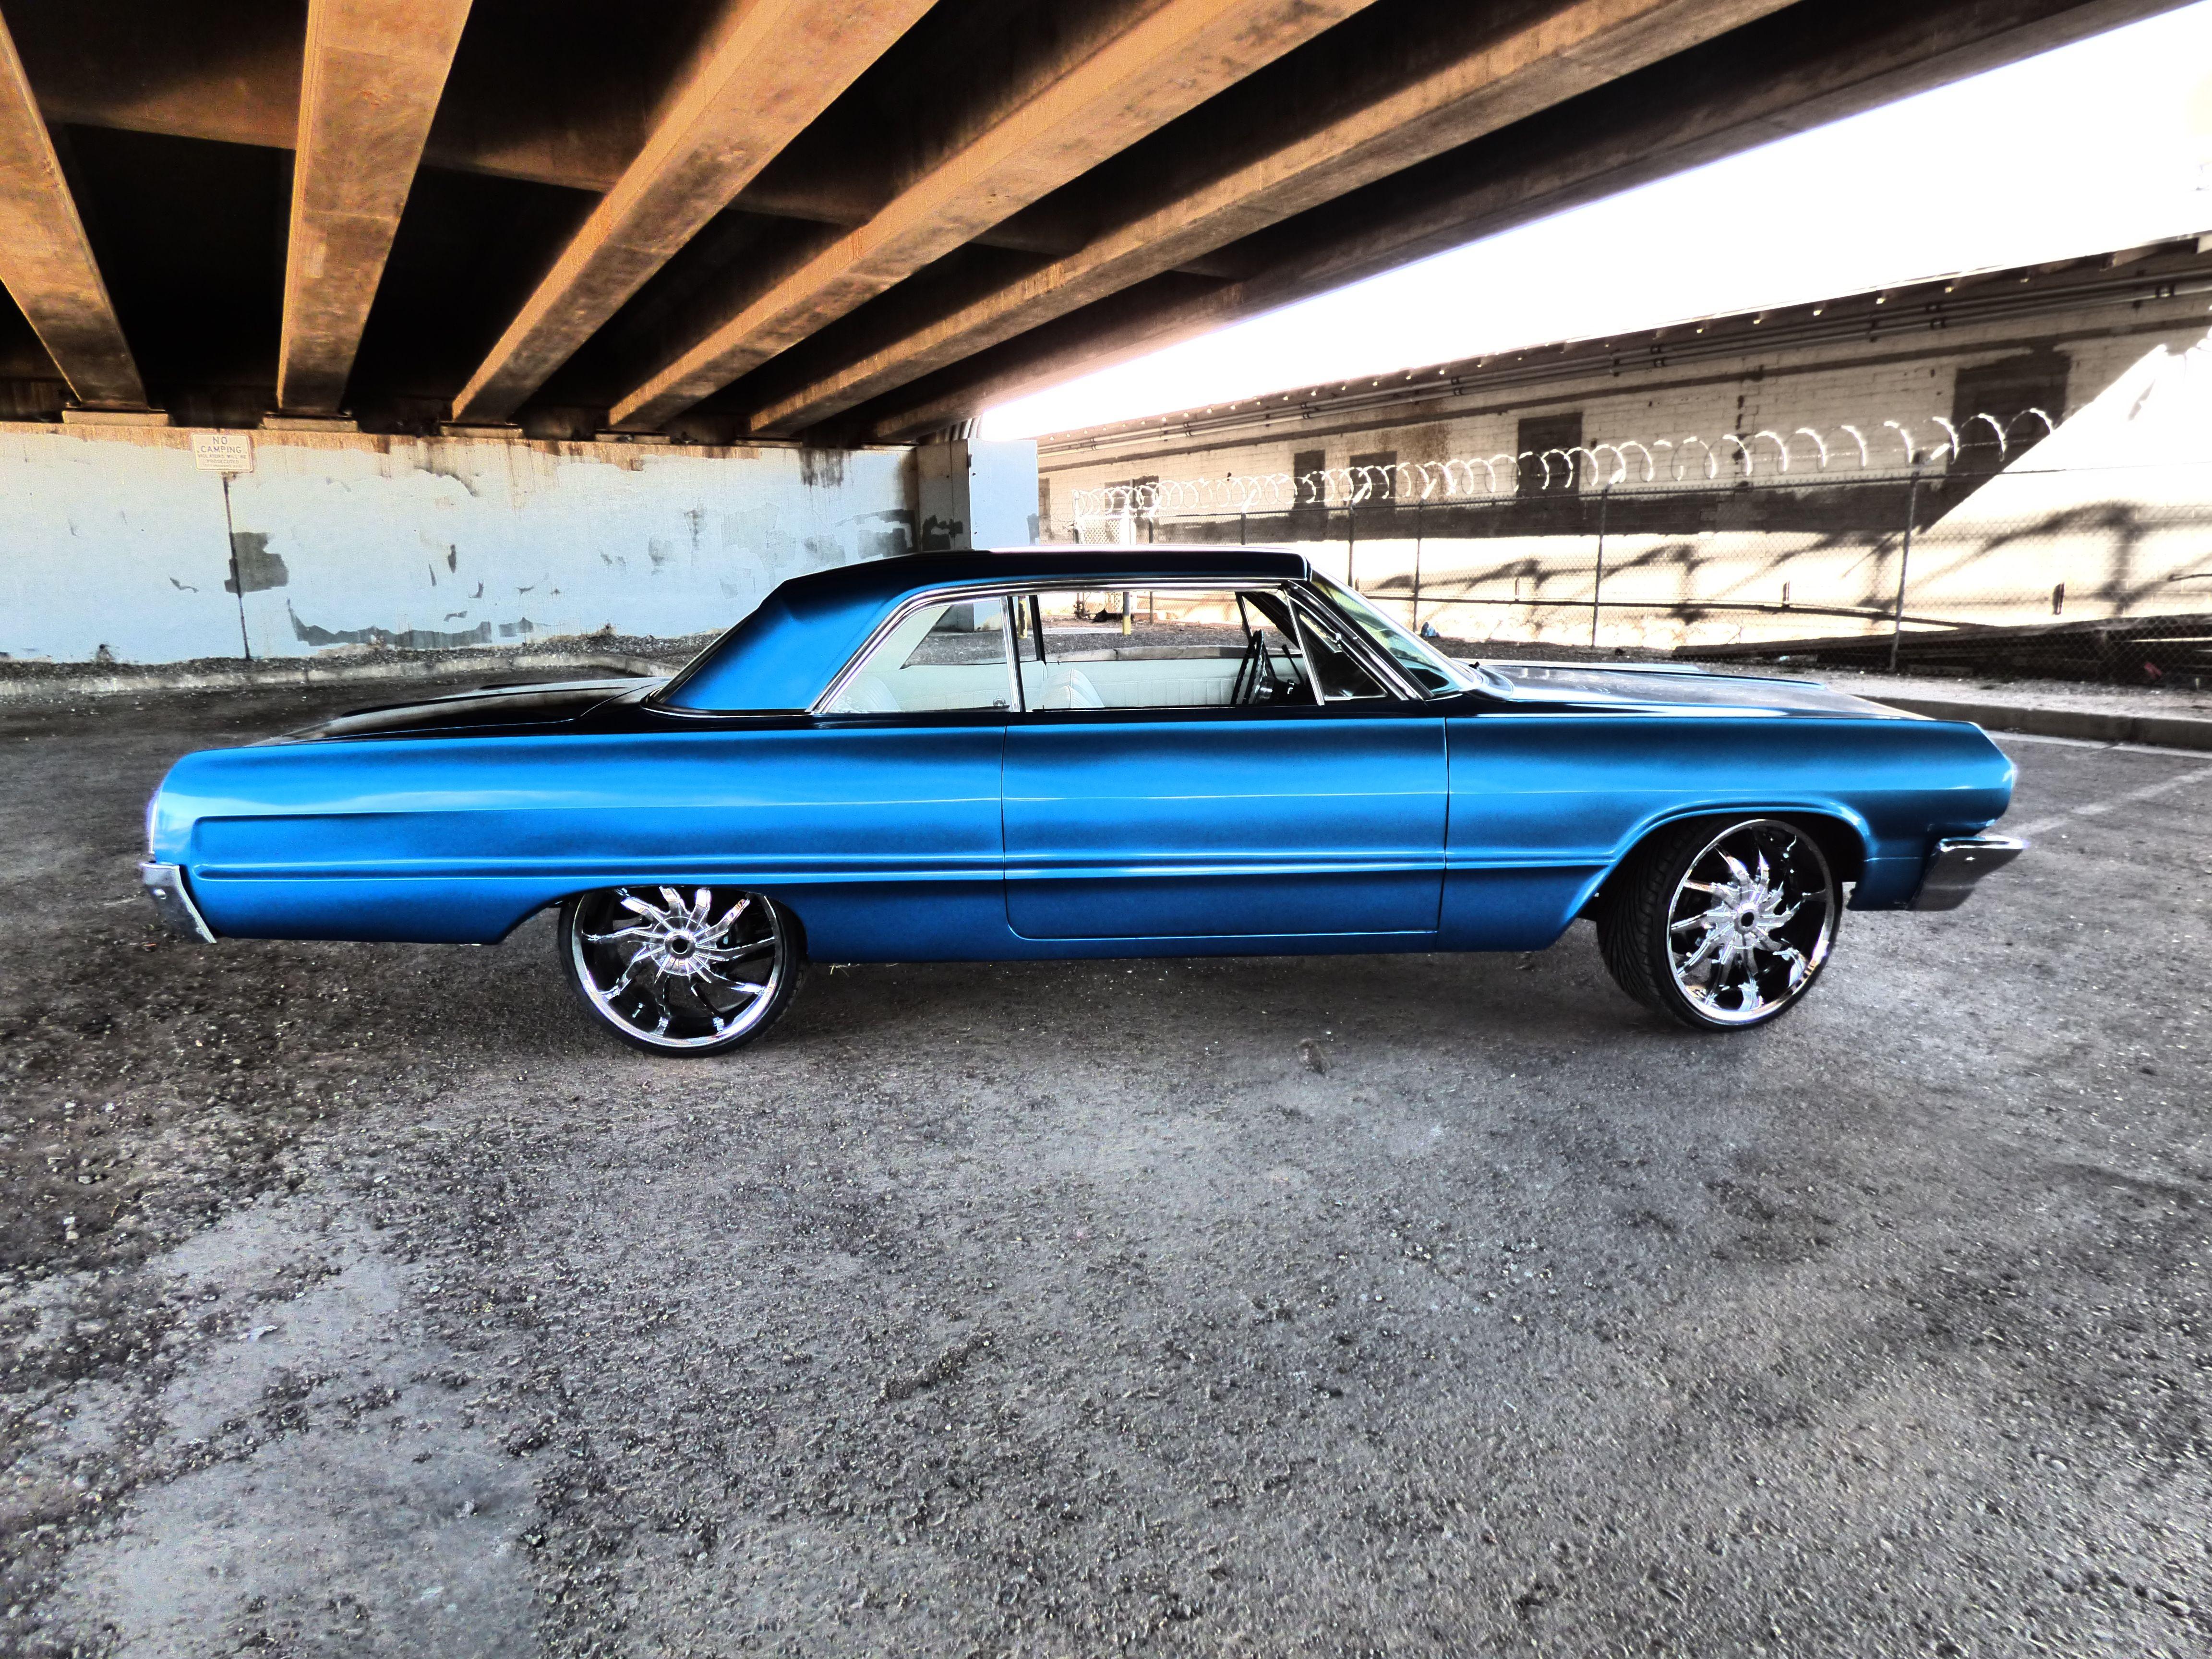 Apex Customs 1964 Chevy Impala Blue 3m Vinyl Wrap Automotive Shops Vinyl Racing Stripes Vinyl Wrap Car